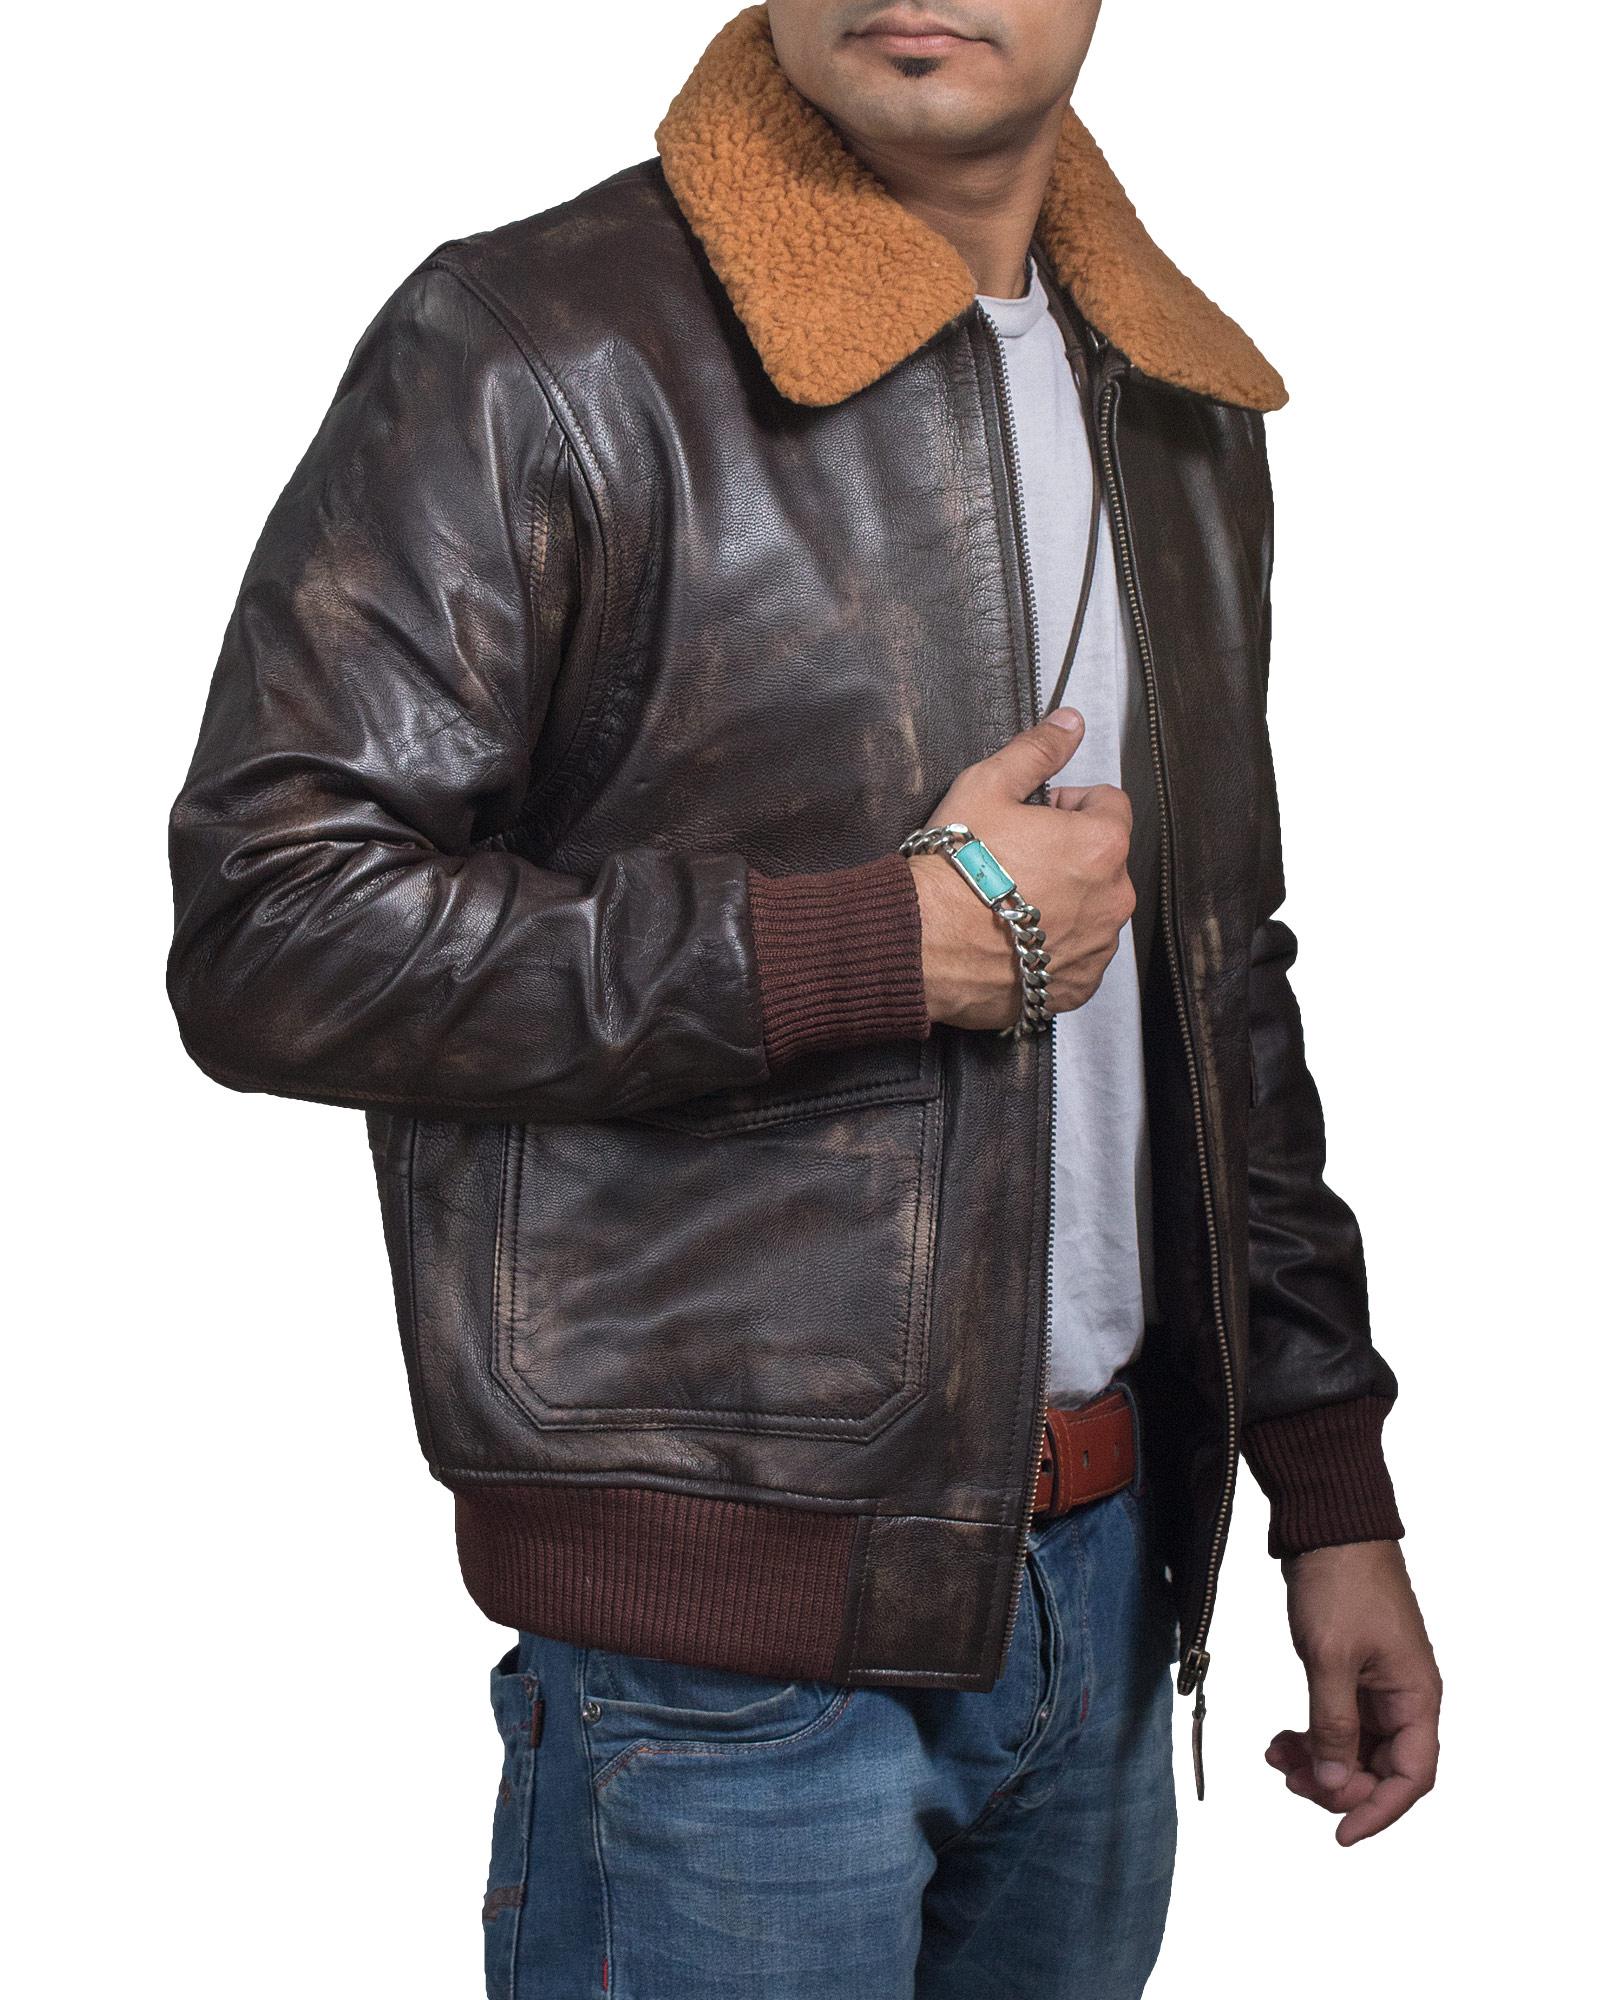 g1-jacket-b